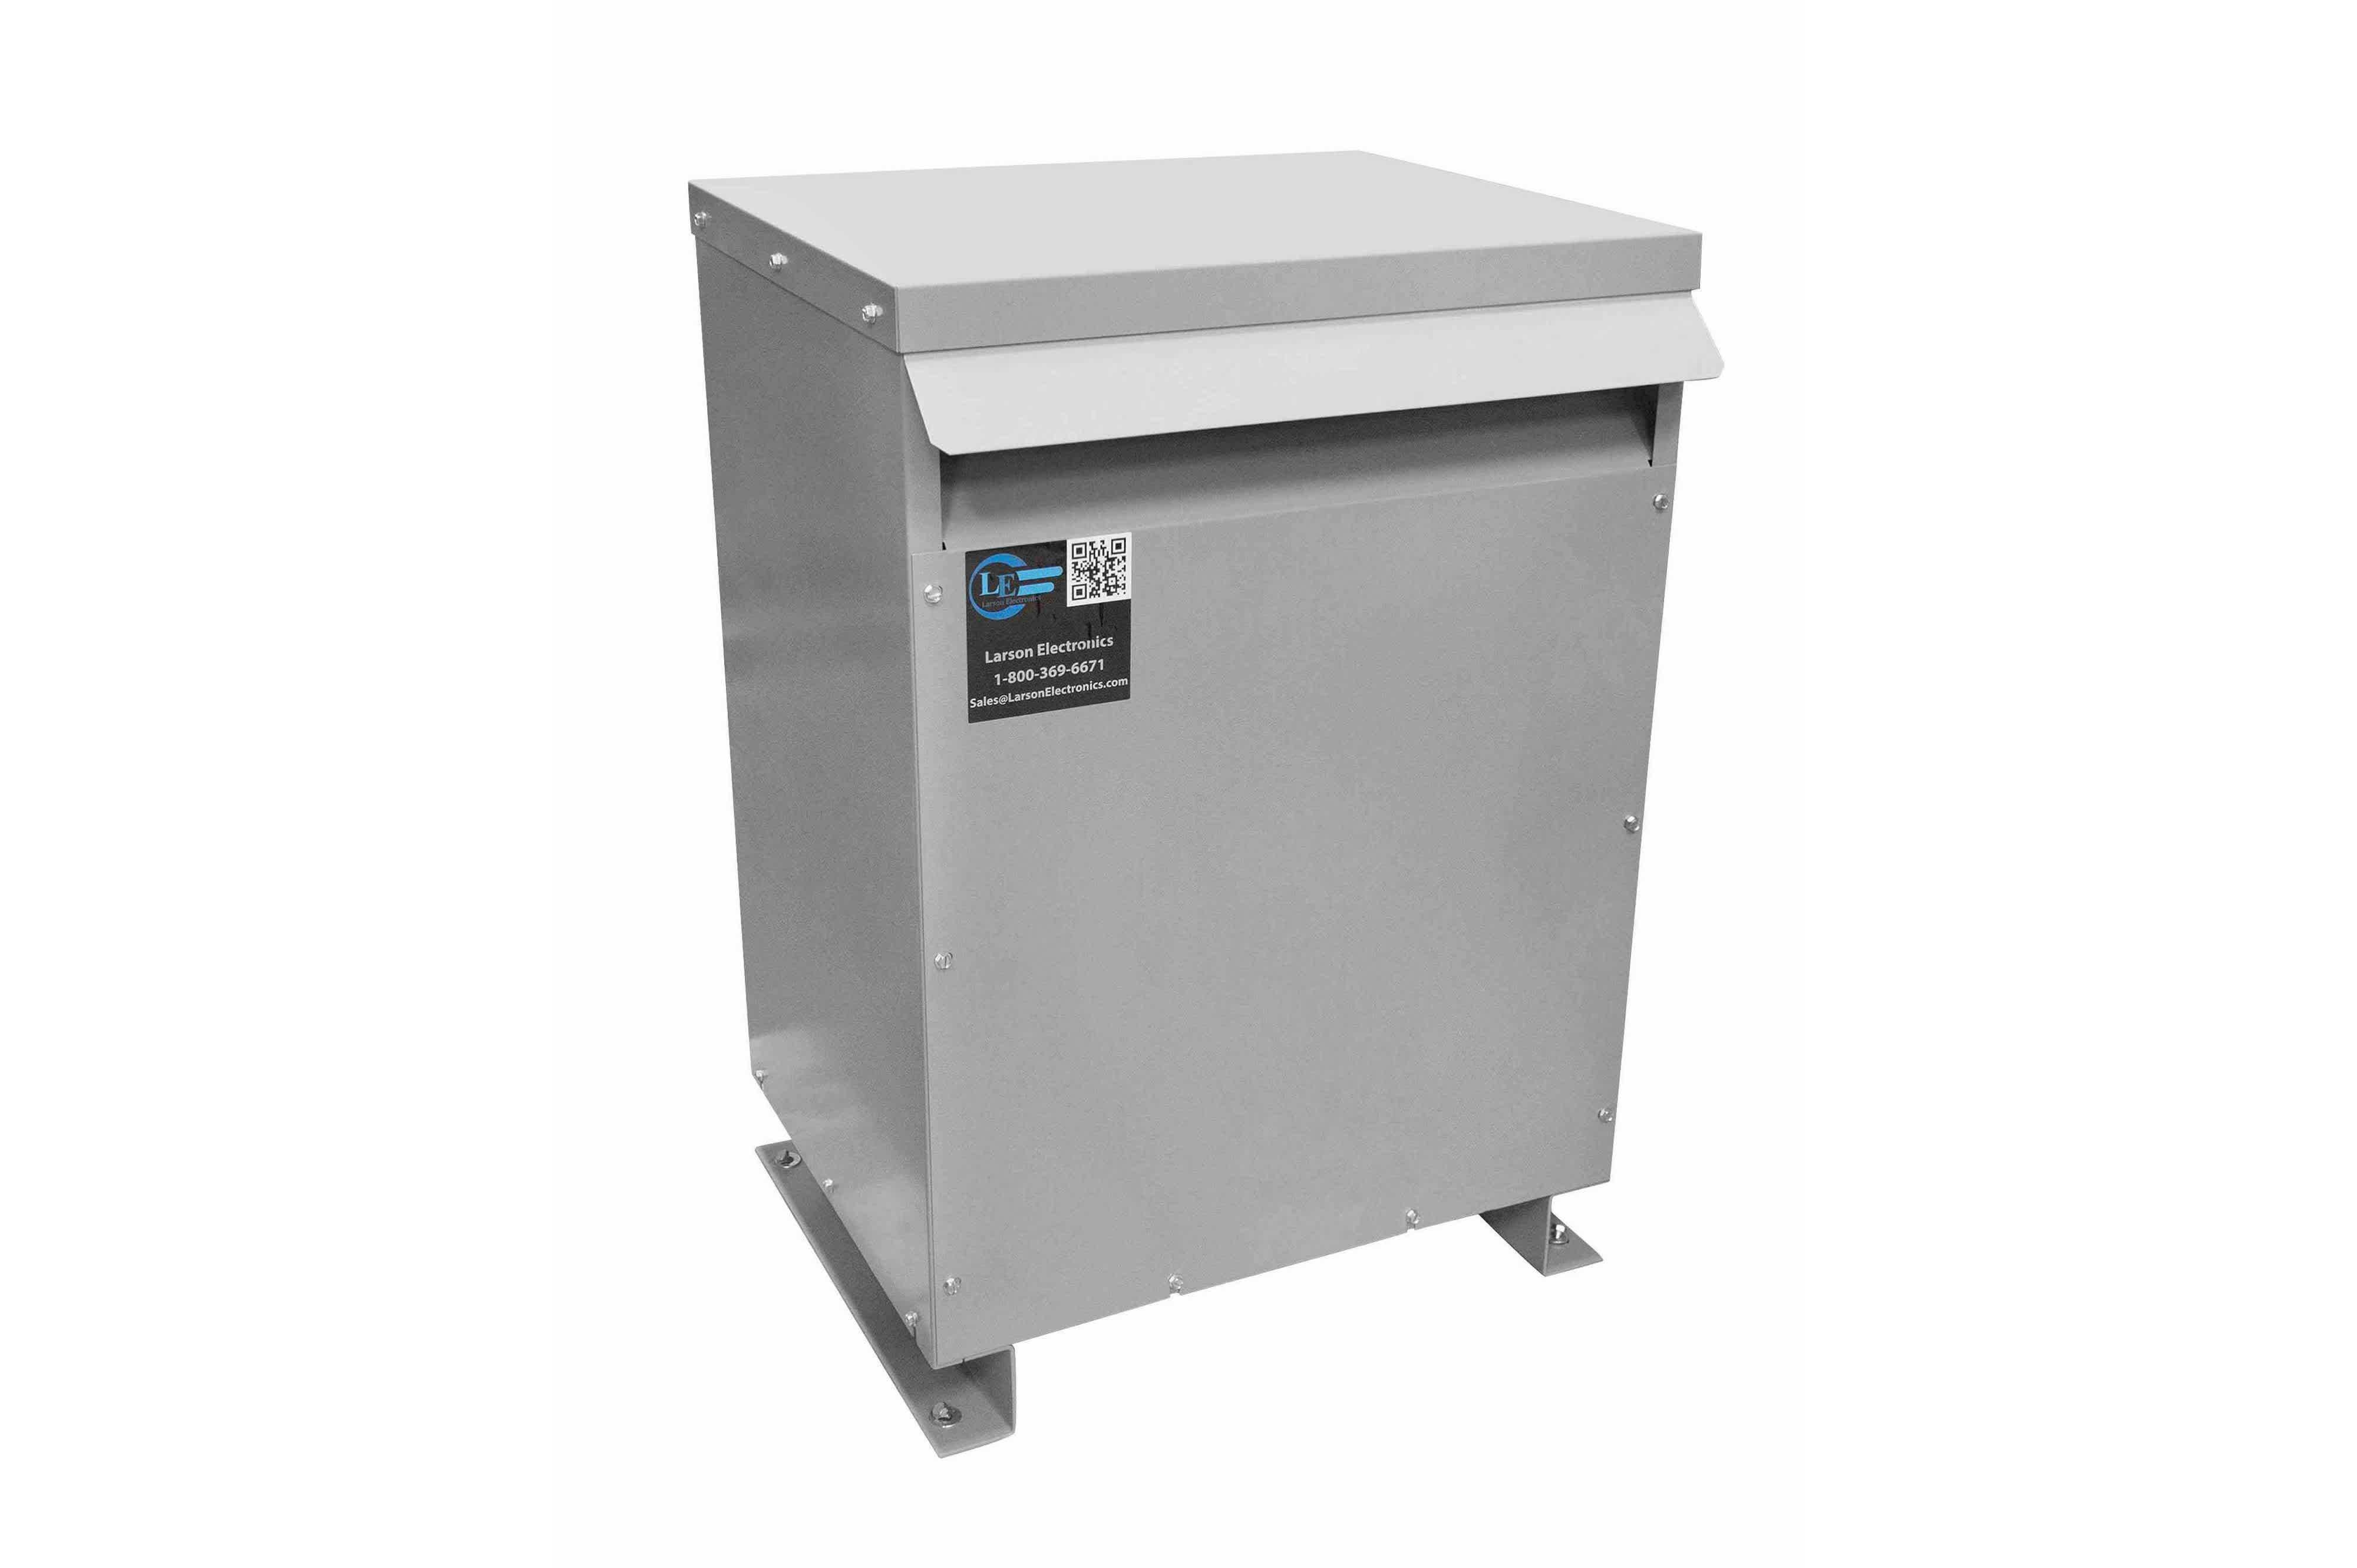 29 kVA 3PH Isolation Transformer, 240V Wye Primary, 208Y/120 Wye-N Secondary, N3R, Ventilated, 60 Hz